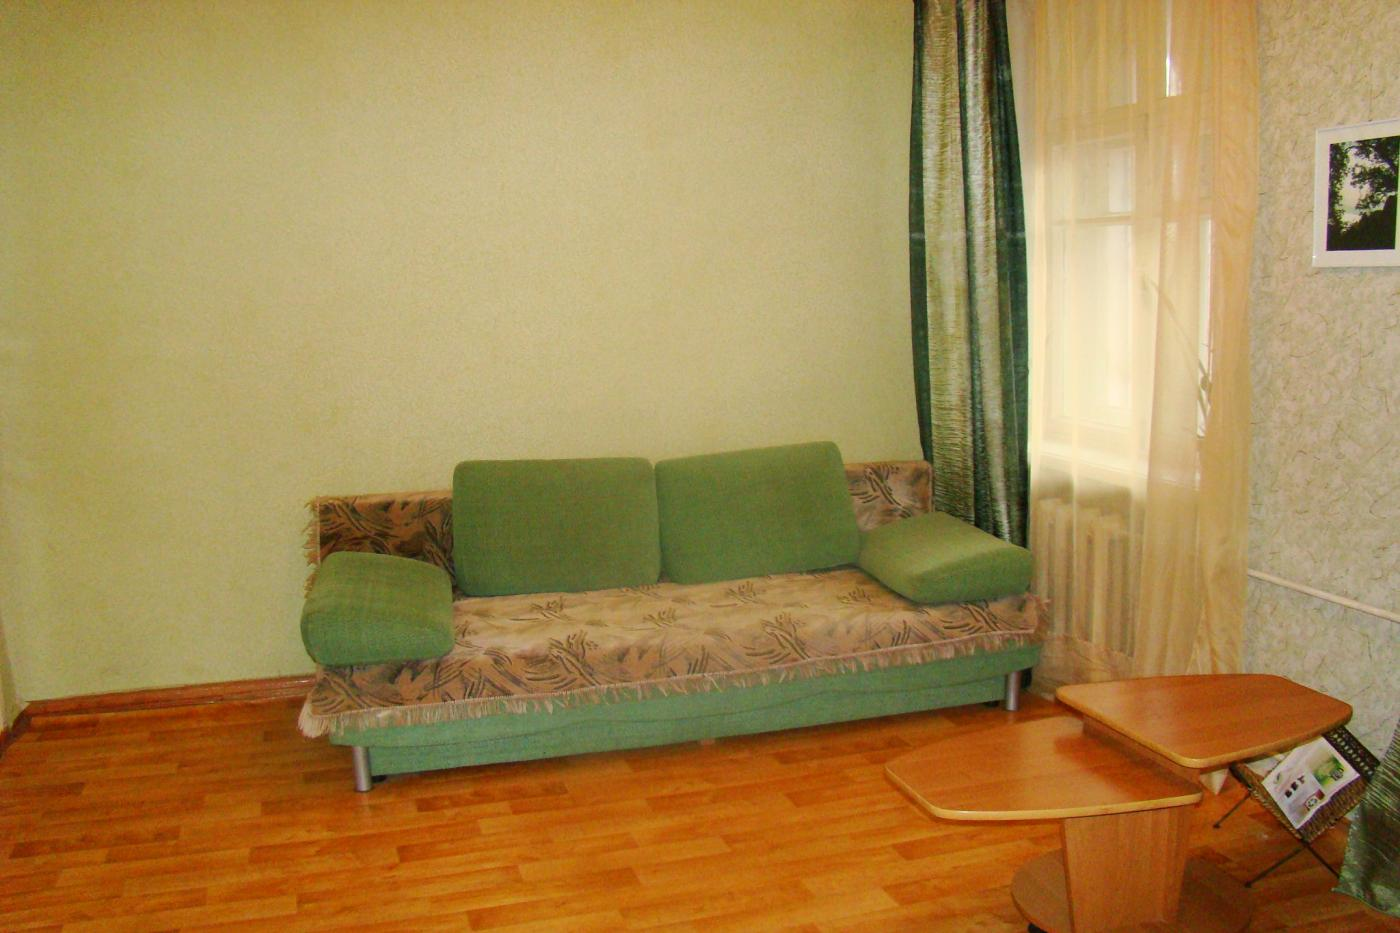 2-комнатная квартира посуточно (вариант № 901), ул. Дыбенко улица, фото № 2